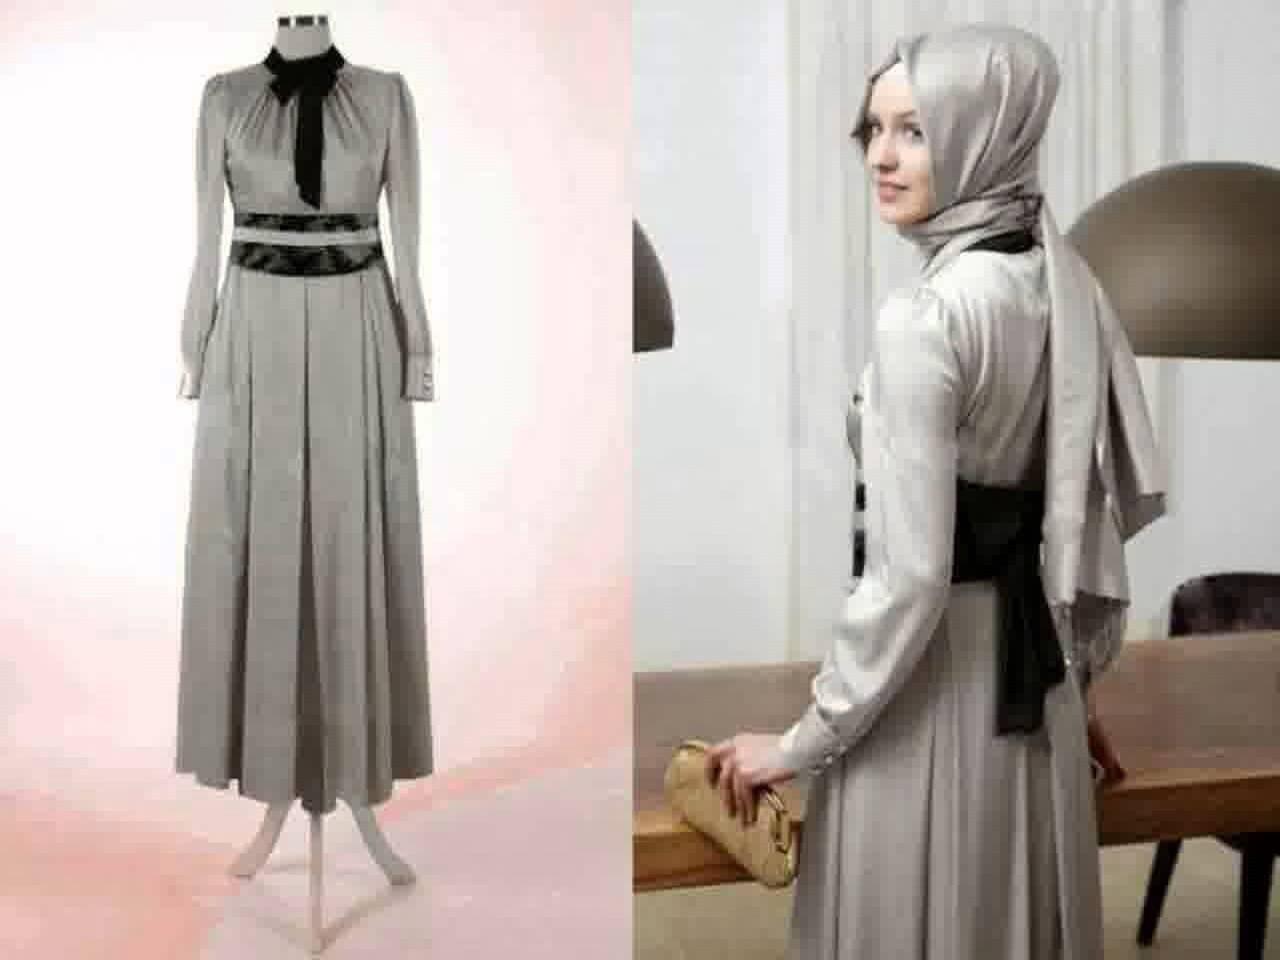 Bentuk Model Baju Lebaran Thn Ini Gdd0 25 Model Baju Lebaran Terbaru Untuk Idul Fitri 2018